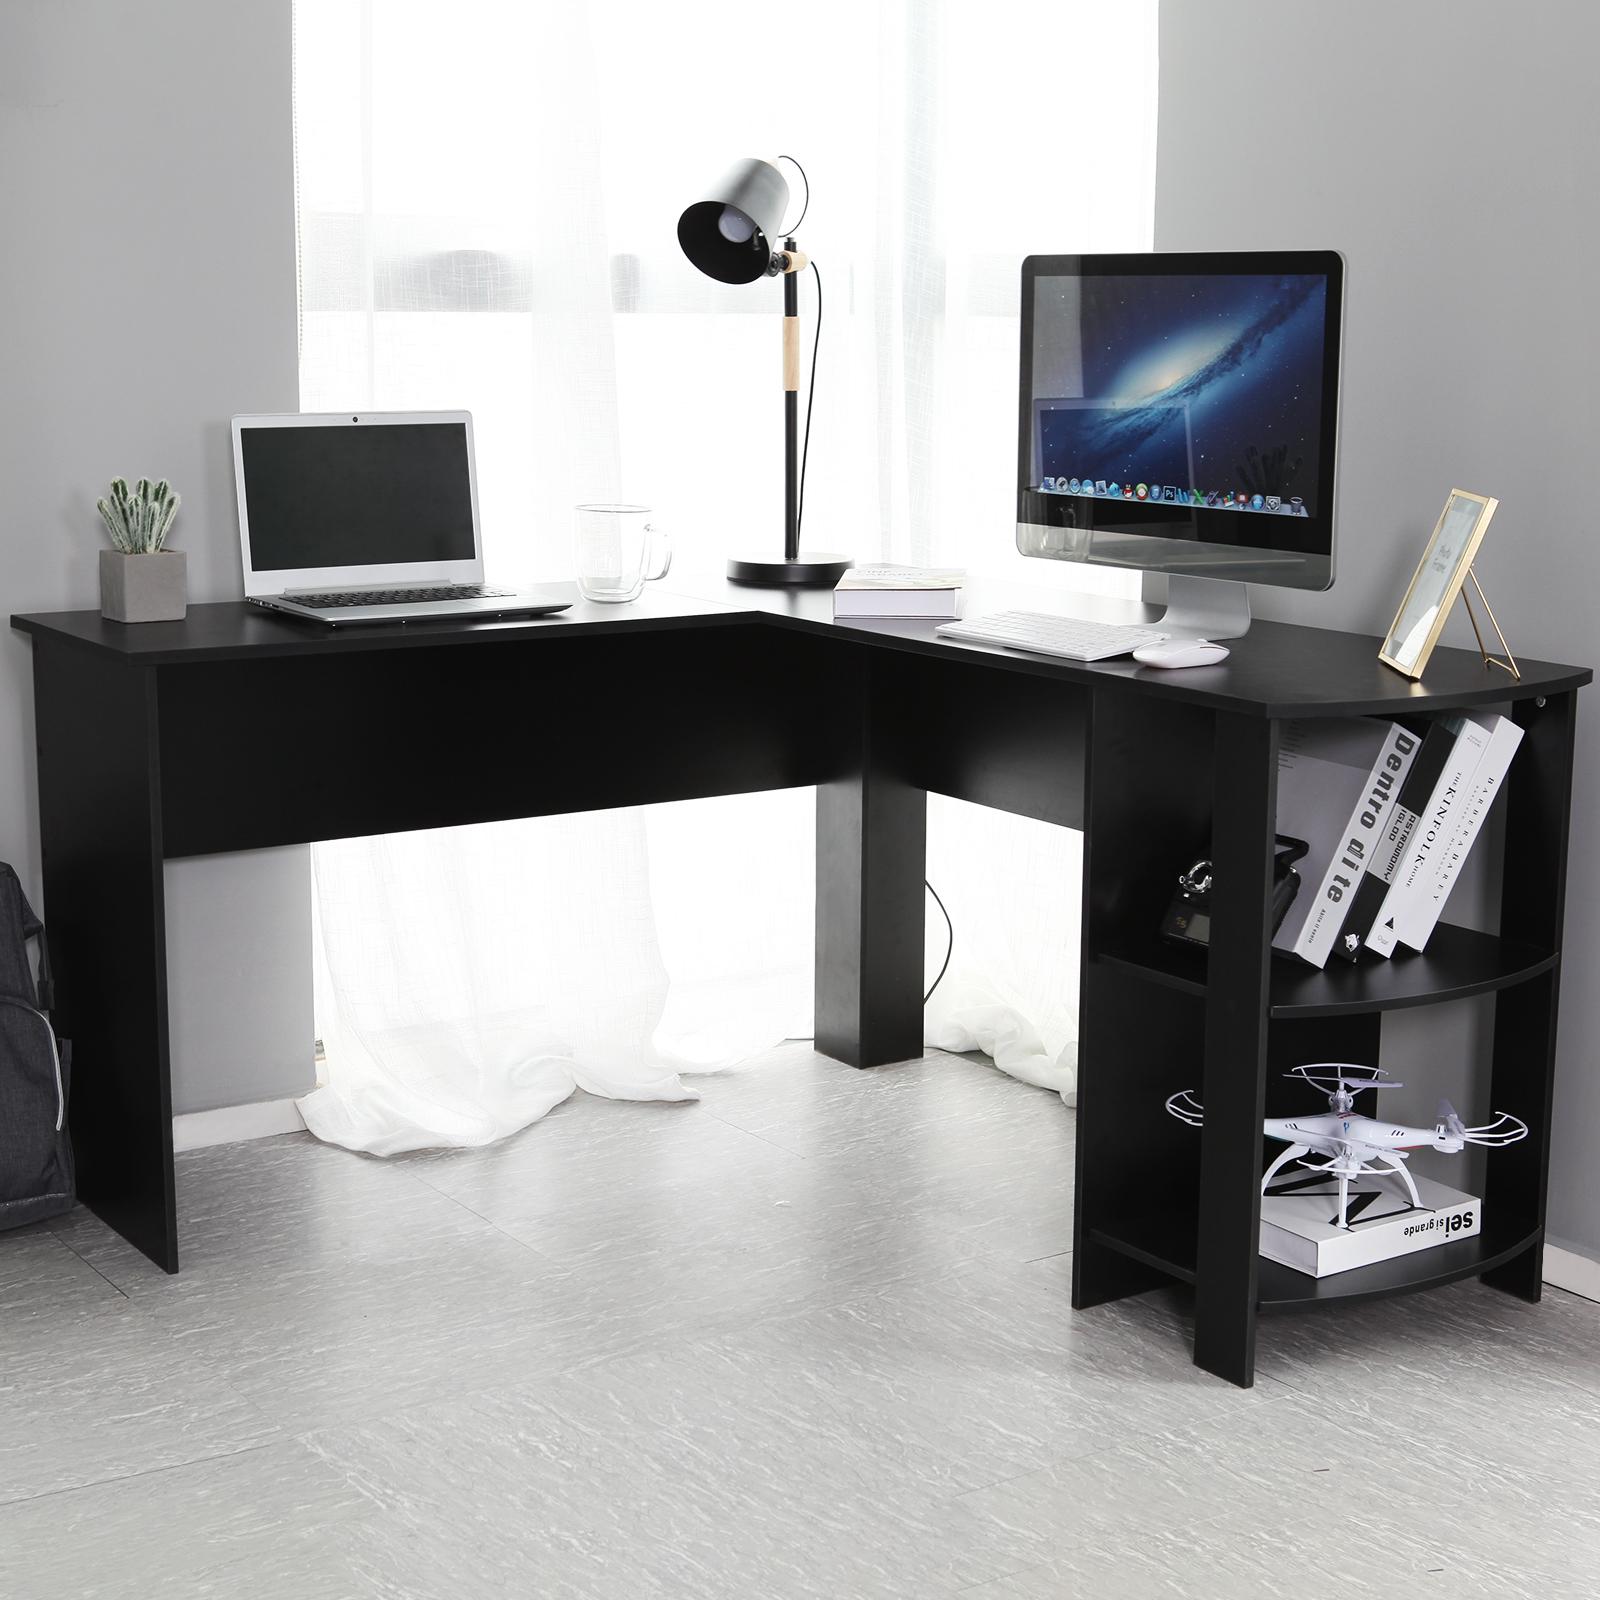 Office Desks Pc Computer Office Desk Corner L Shape White Black Table Workstation W Shelves Business Office Industrial Supplies Indianbusinesstrade Com